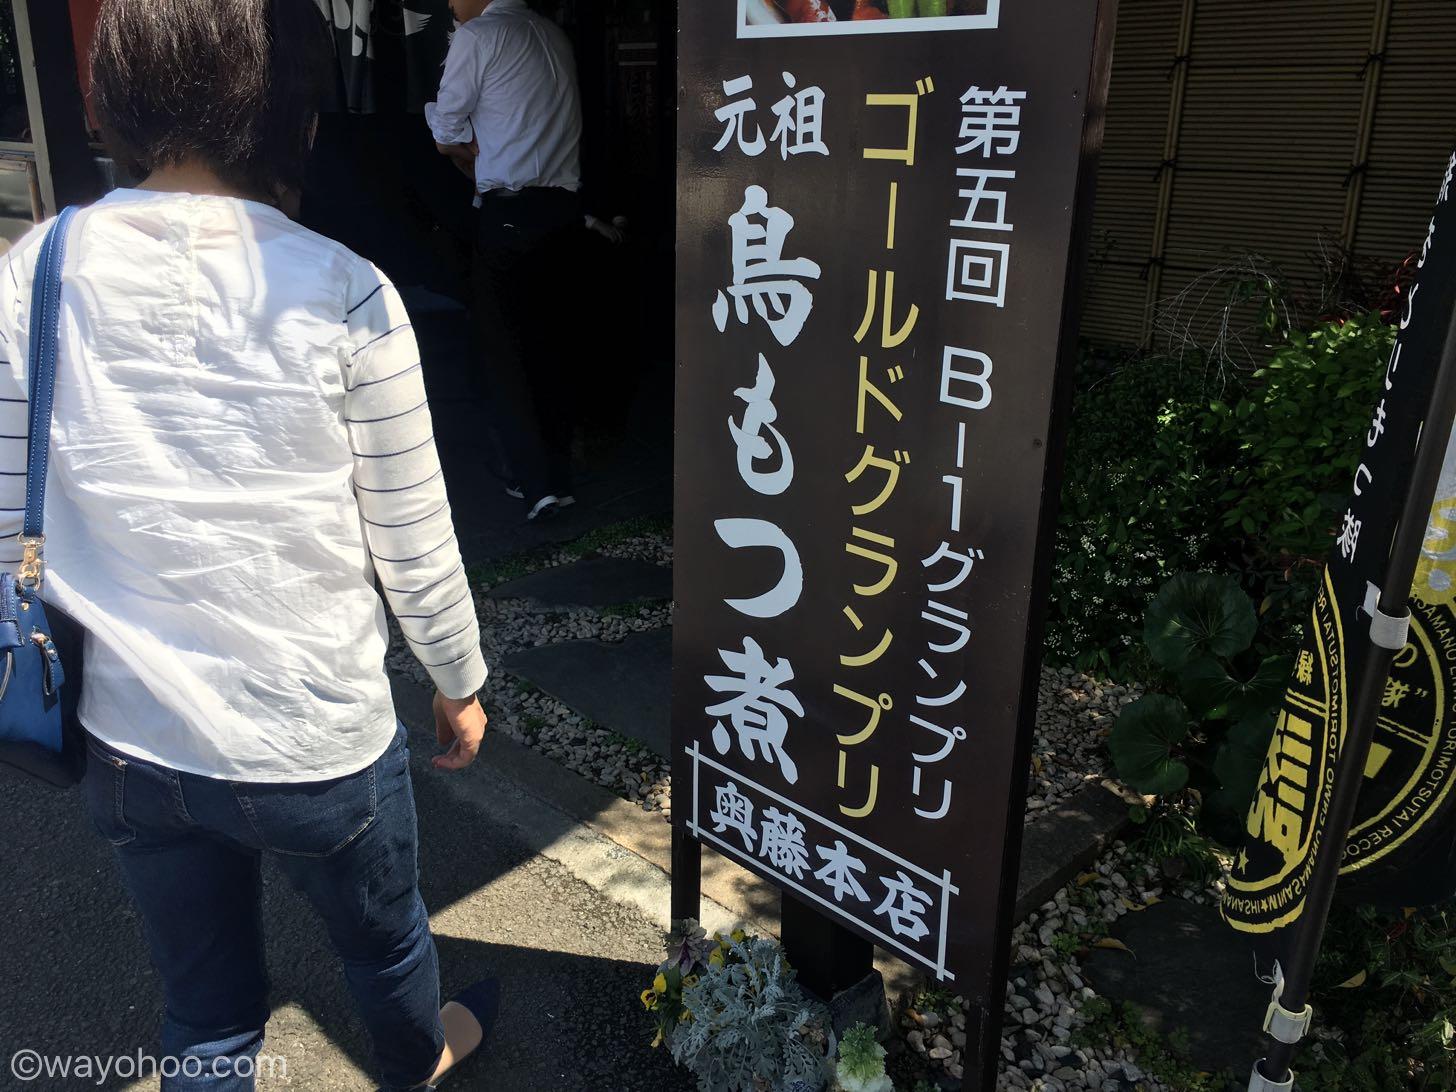 B-1グランプリを獲得した山梨名物の奥藤本店「元祖 甲府鳥もつ煮」